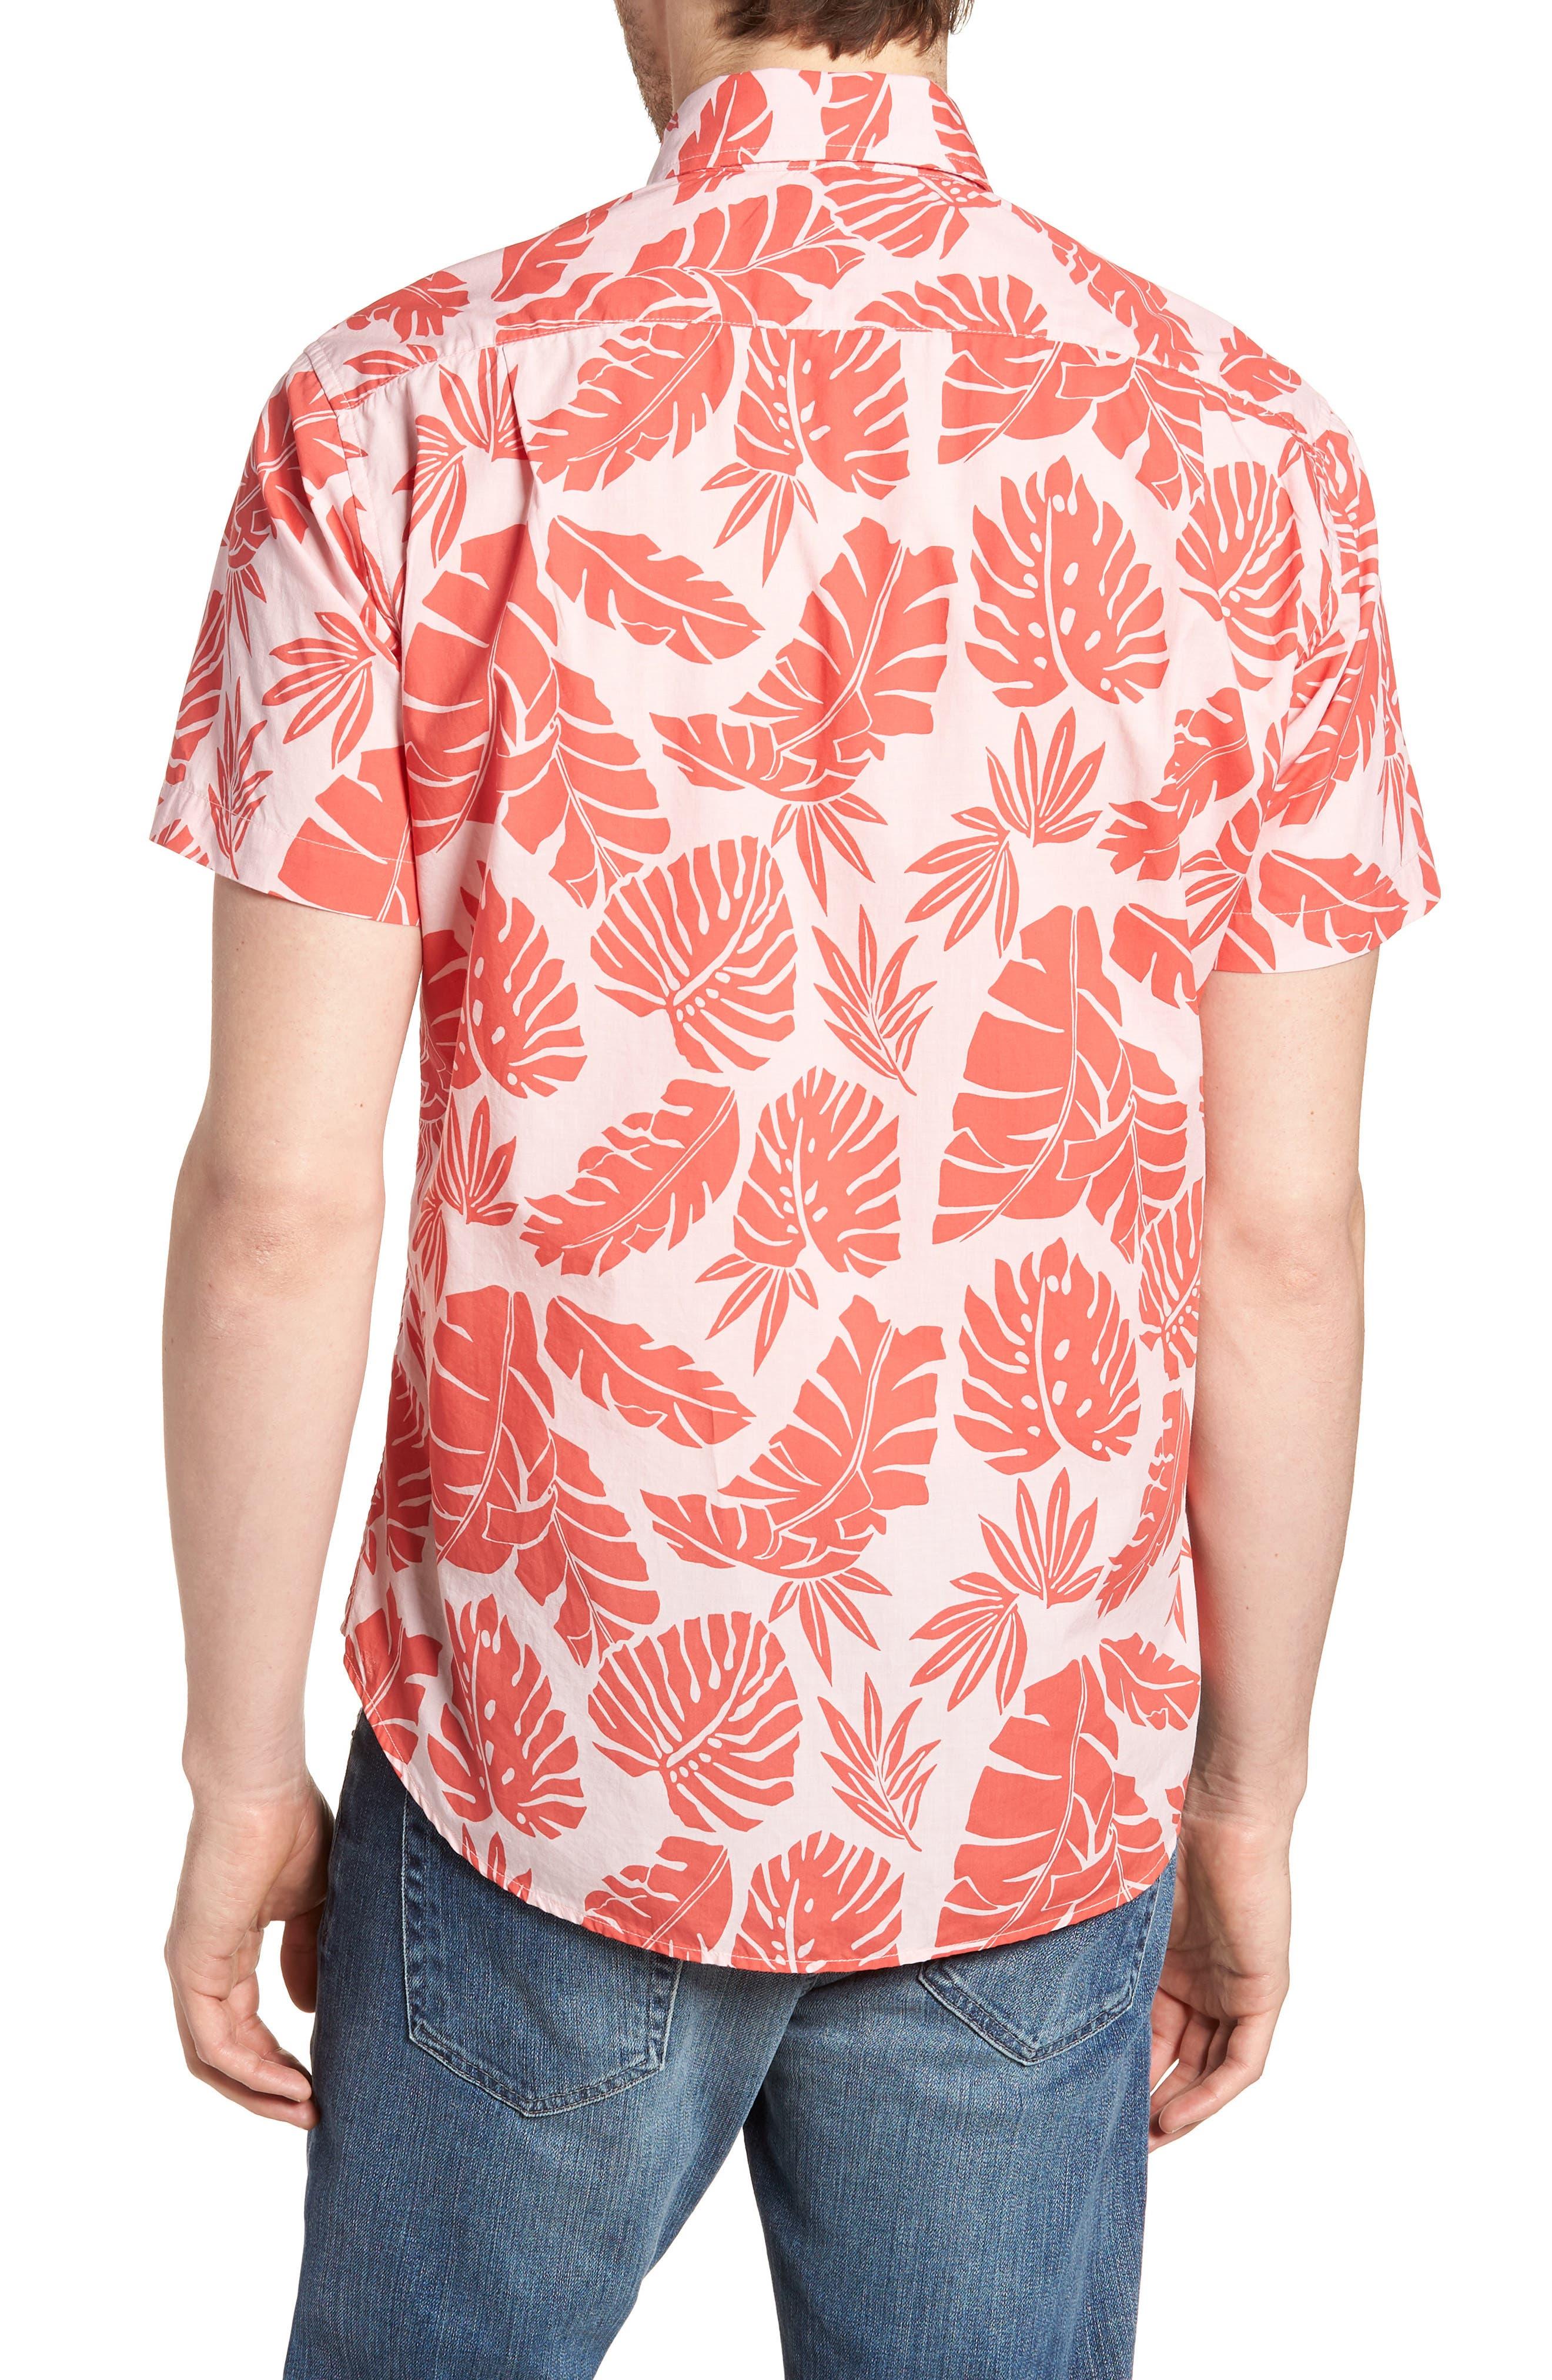 Riviera Slim Fit Palm Print Sport Shirt,                             Alternate thumbnail 2, color,                             PALM SCATTER - CORAL FAN